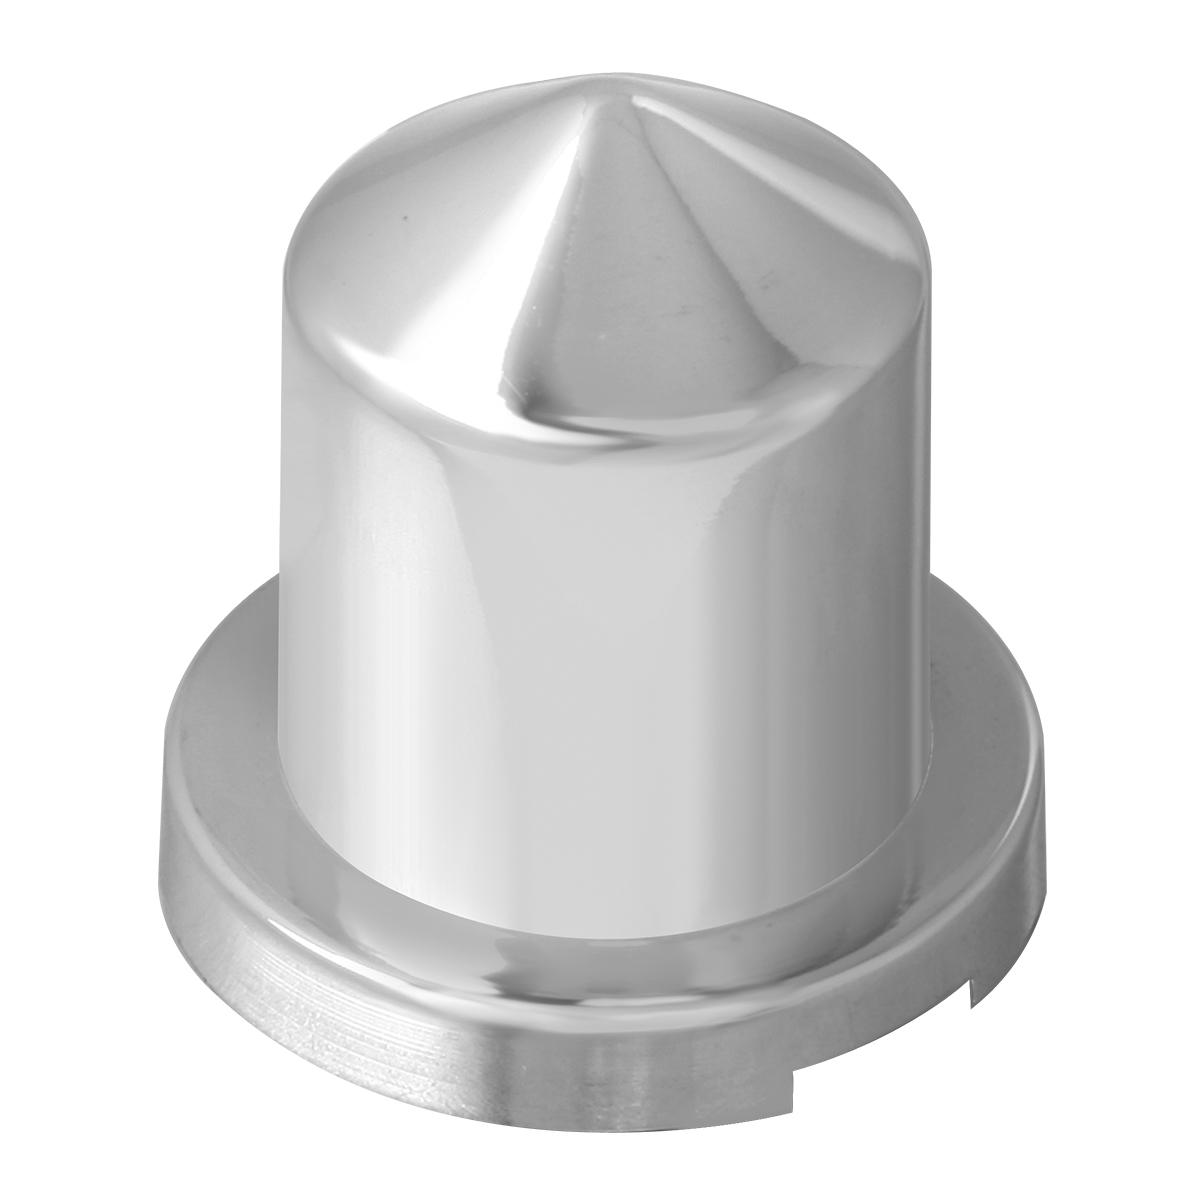 "10131 Chrome Plastic 5/8"" Side Step Nut Cover"